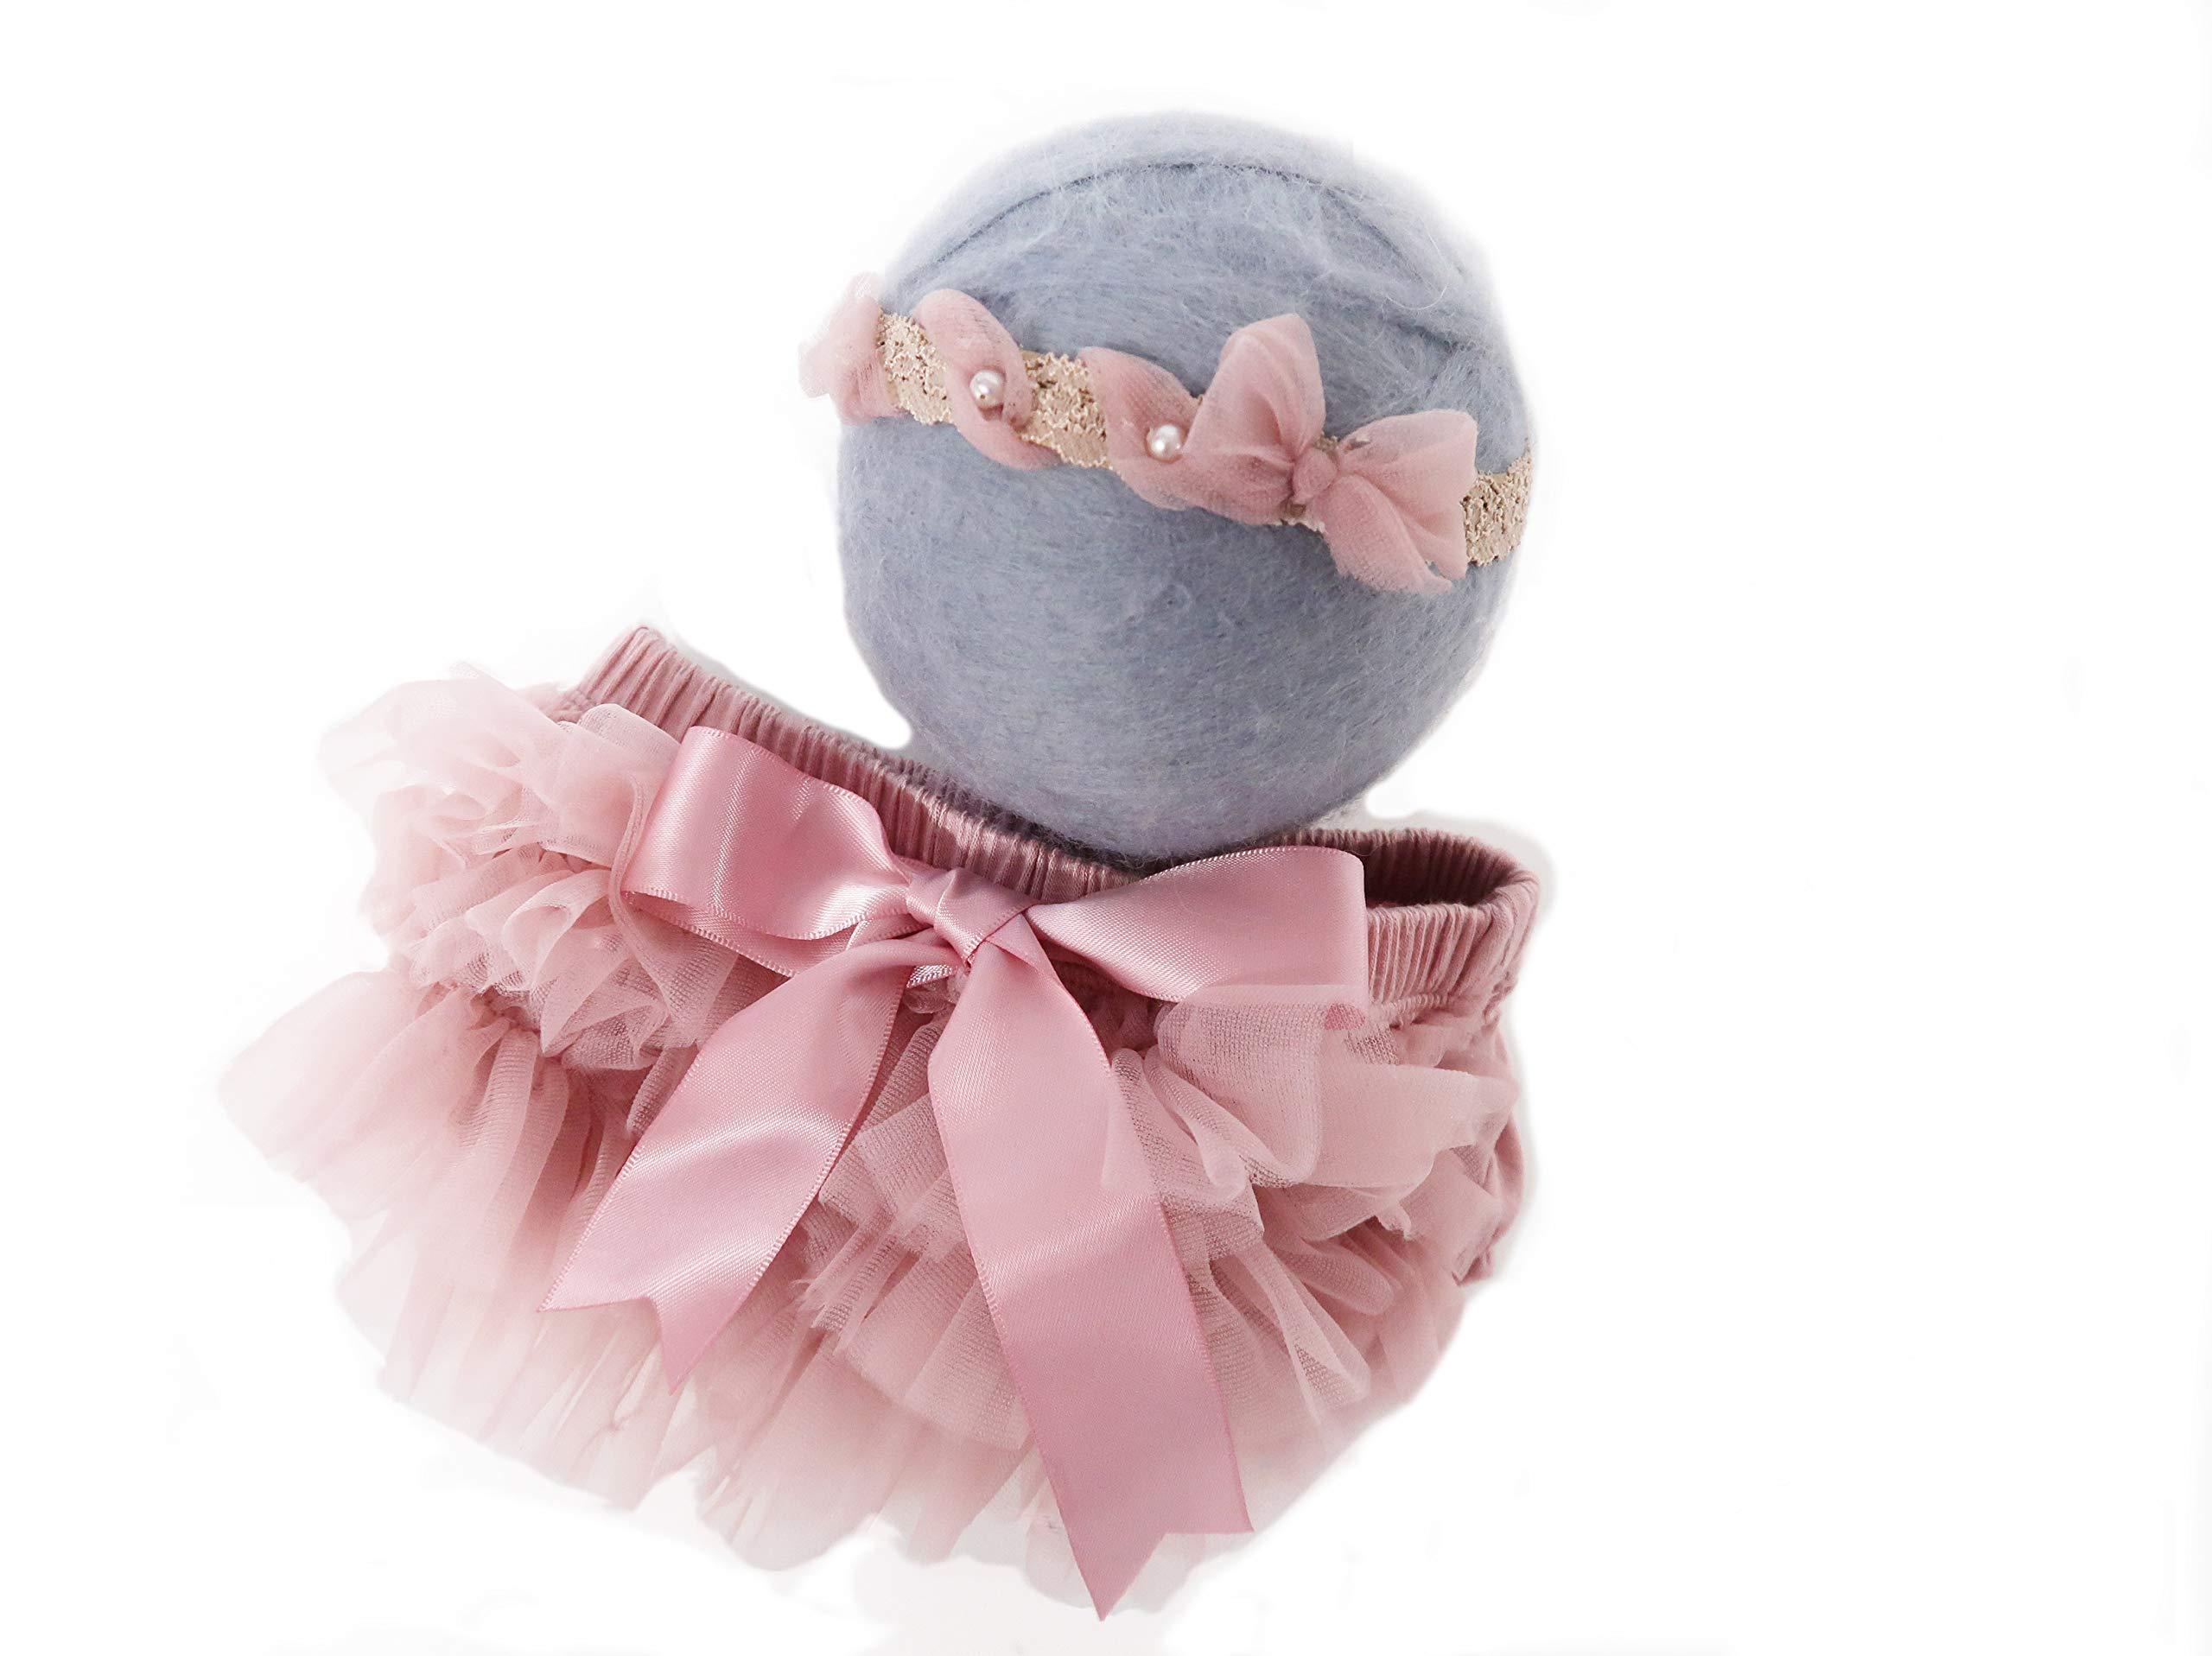 Custom Photo Props, Professional Newborn Photography, Chiffon Diaper Cover with Matching Headband Set, Old Rose